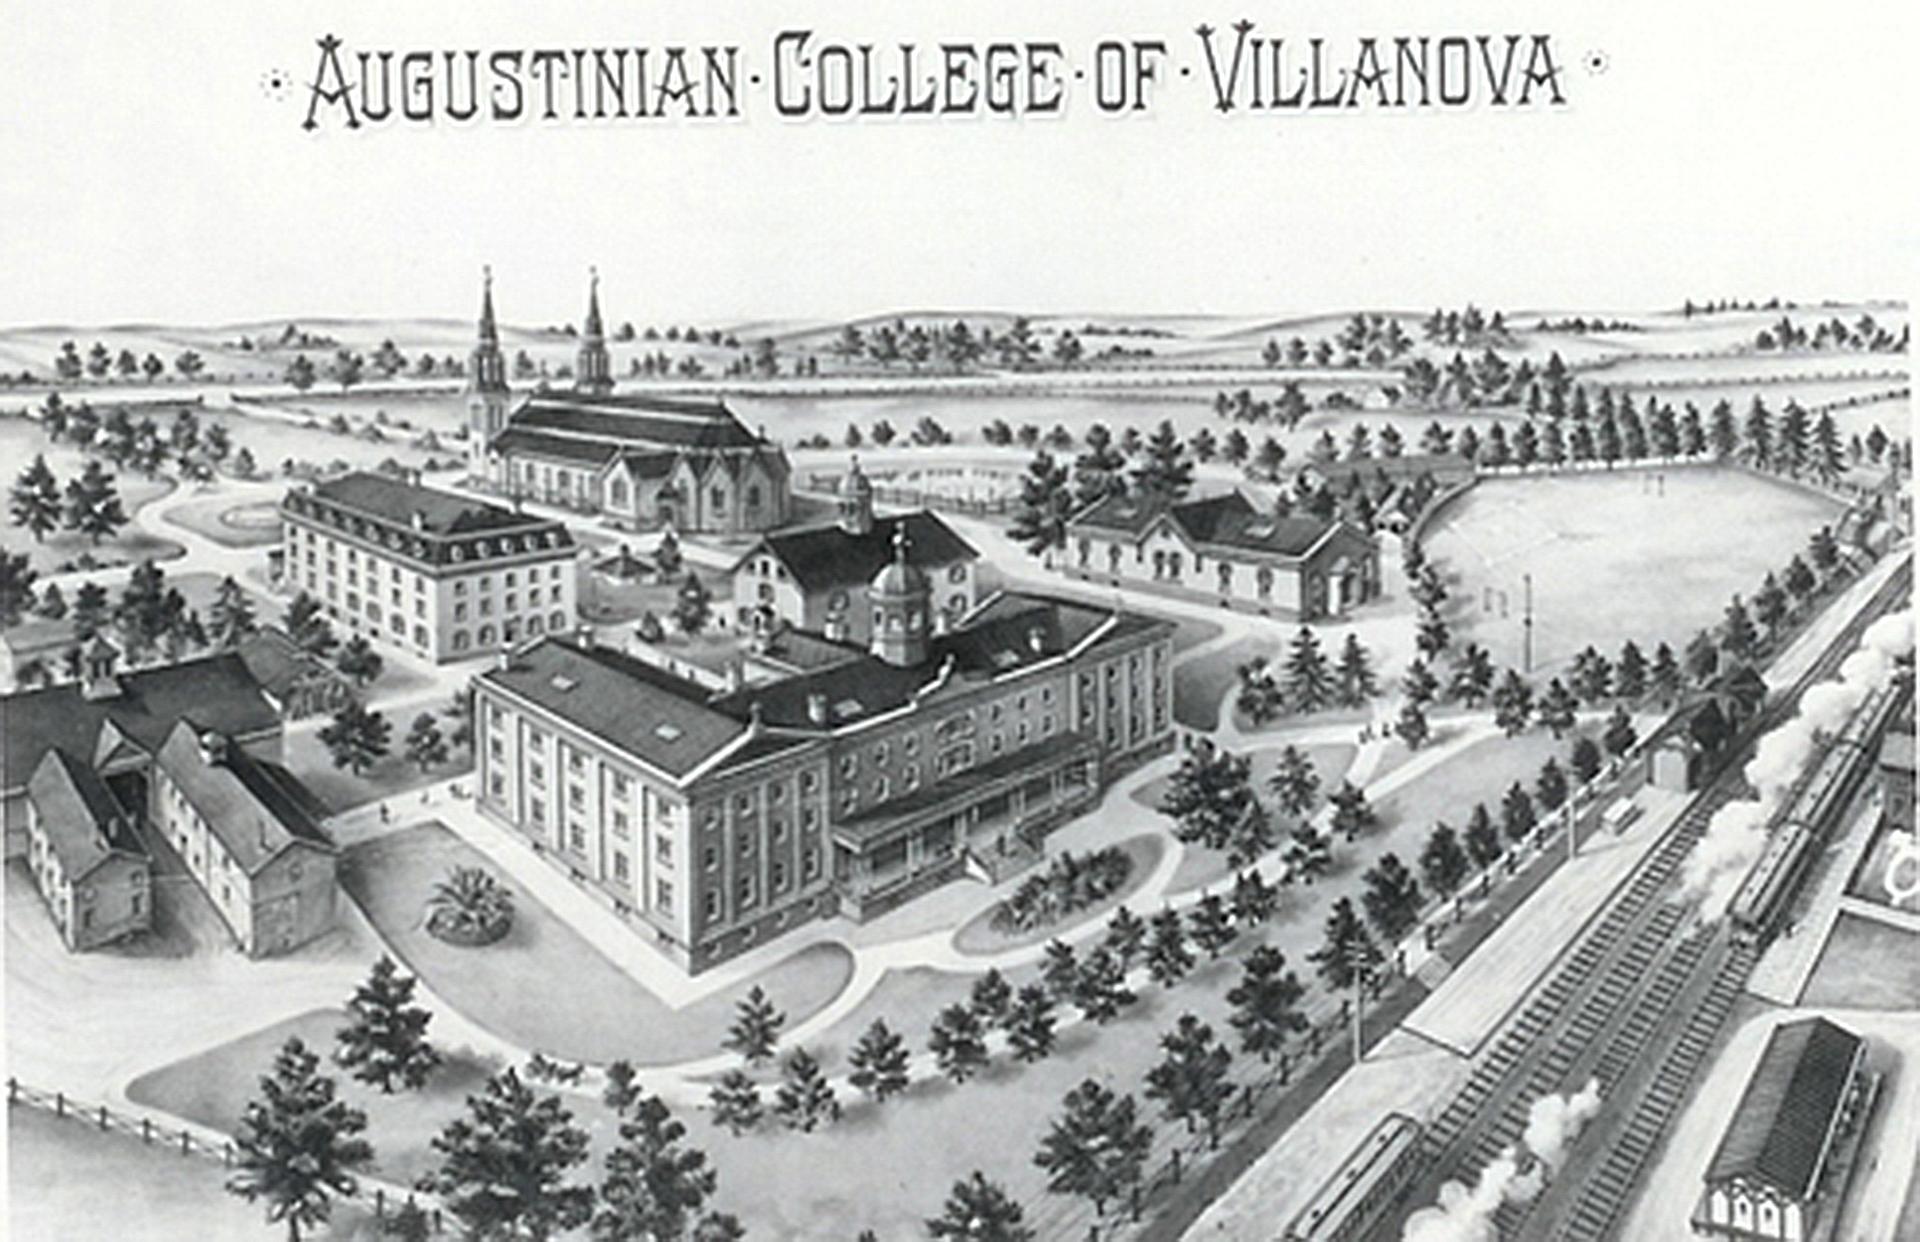 Augustinian College of Villanova